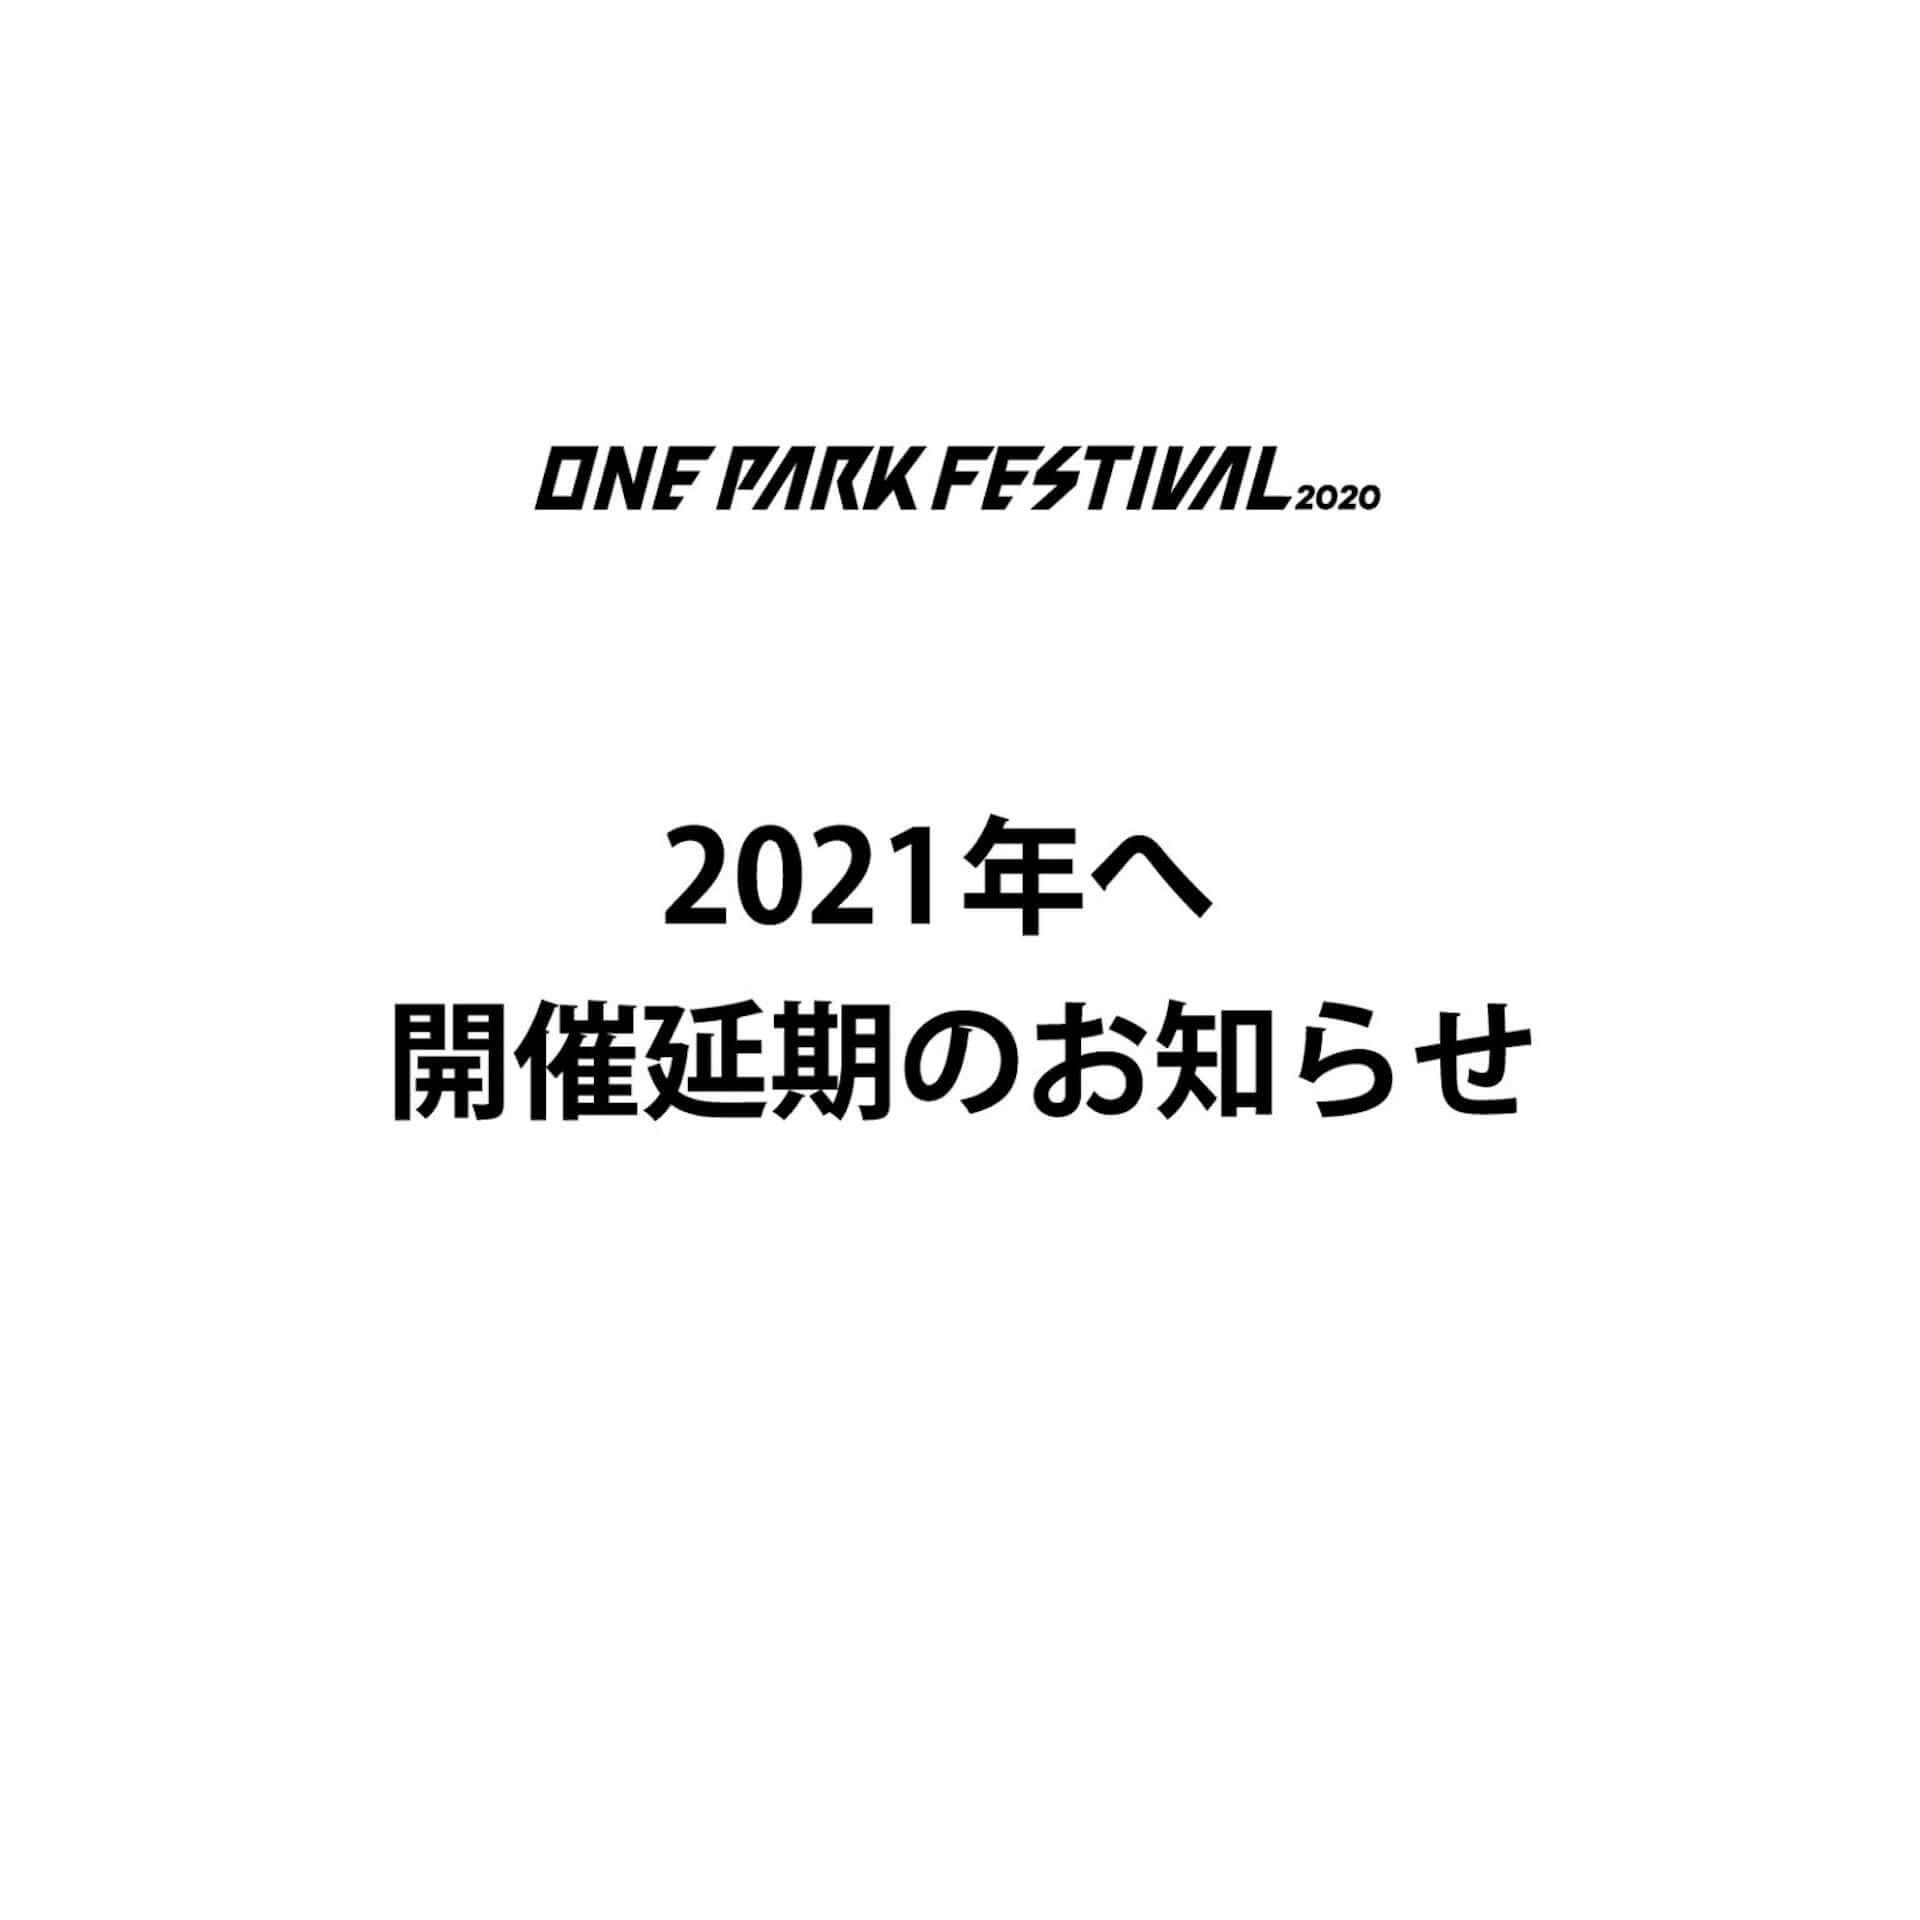 "<ONE PARK FESTIVAL 2020>が開催延期に|SOIL&""PIMP""SESSIONS・社長からのメッセージも music200518_oneparkfes2020_1-1920x1920"